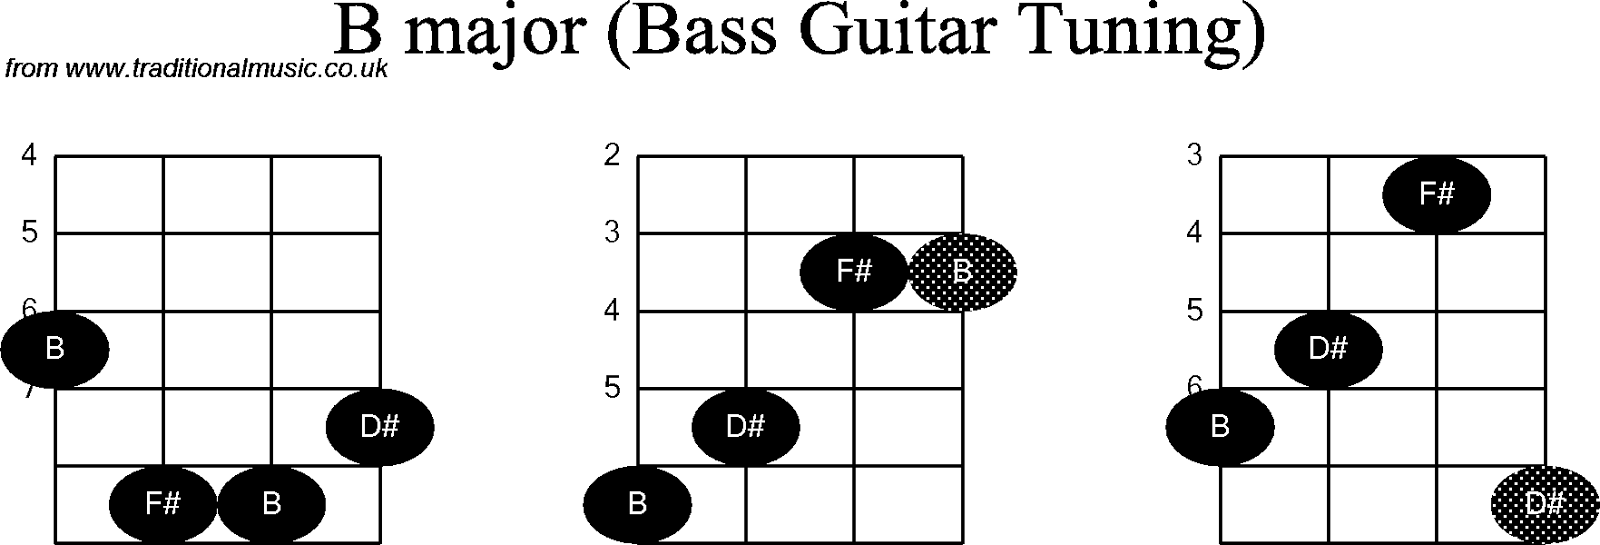 Gambar kunci gitar bass chords lengkap freewaremini music gambar kunci gitar bass chords lengkap freewaremini hexwebz Choice Image